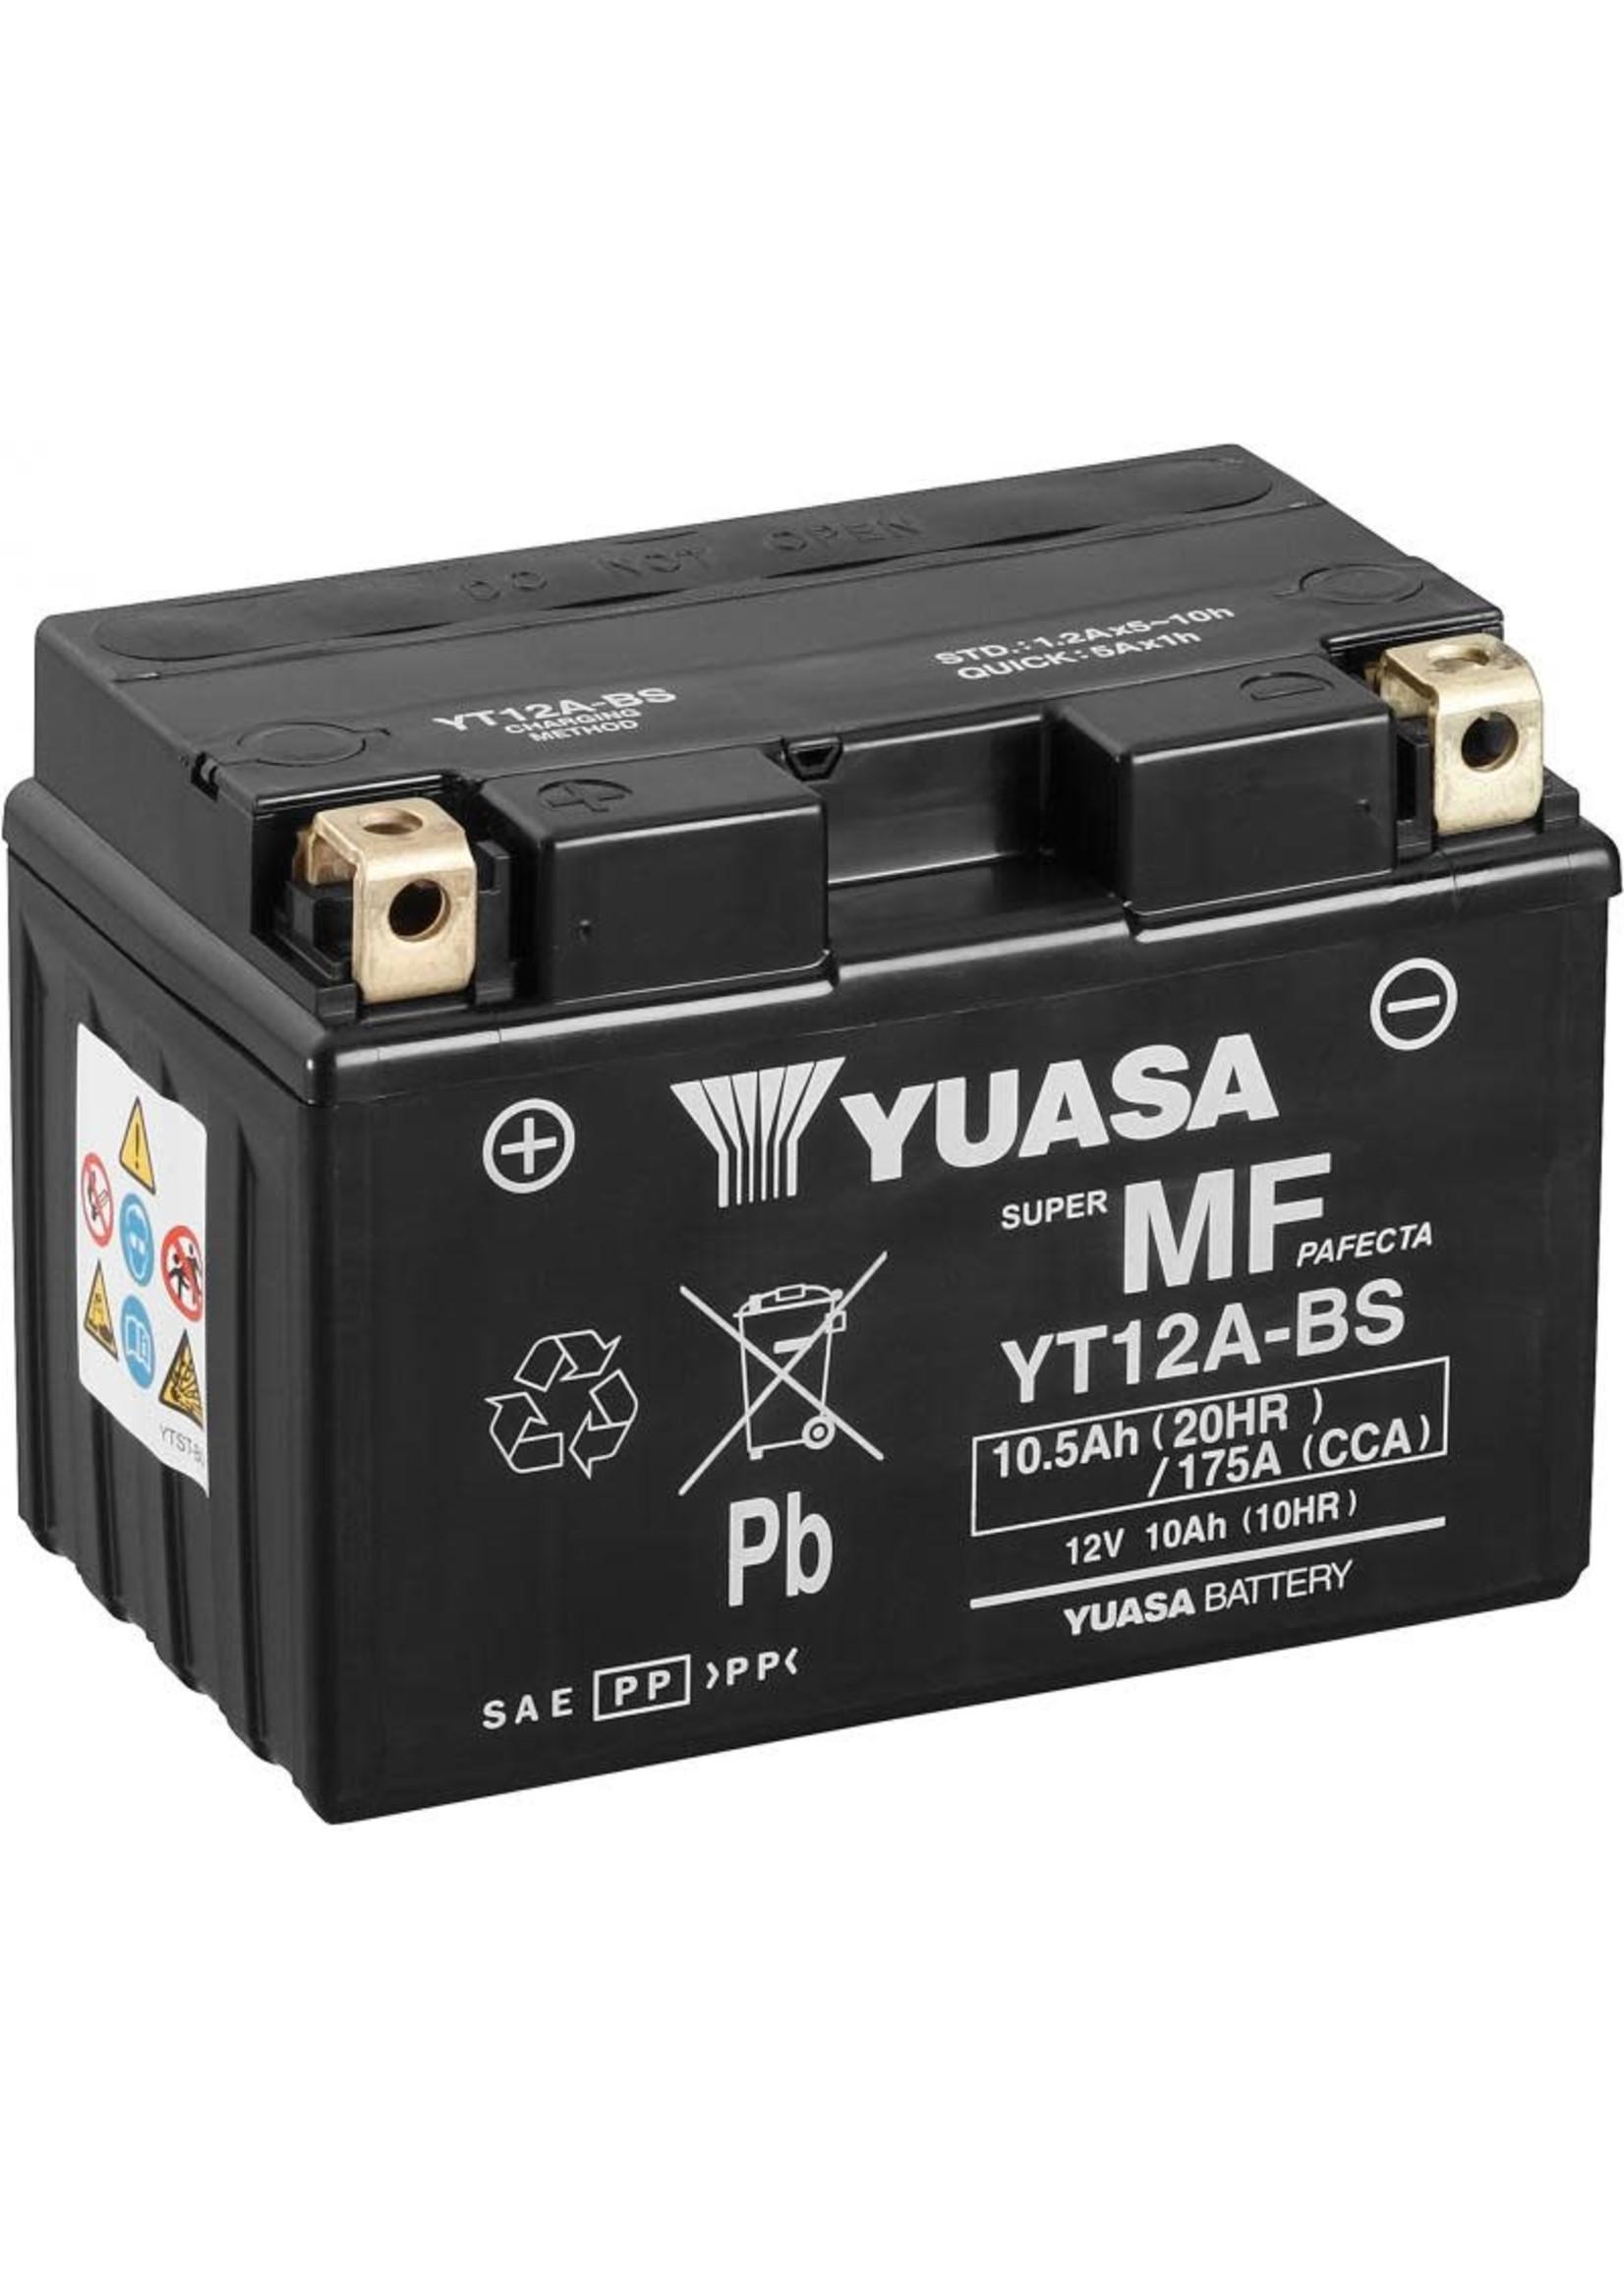 YUASA YUASA YT12A-BS (DRY)